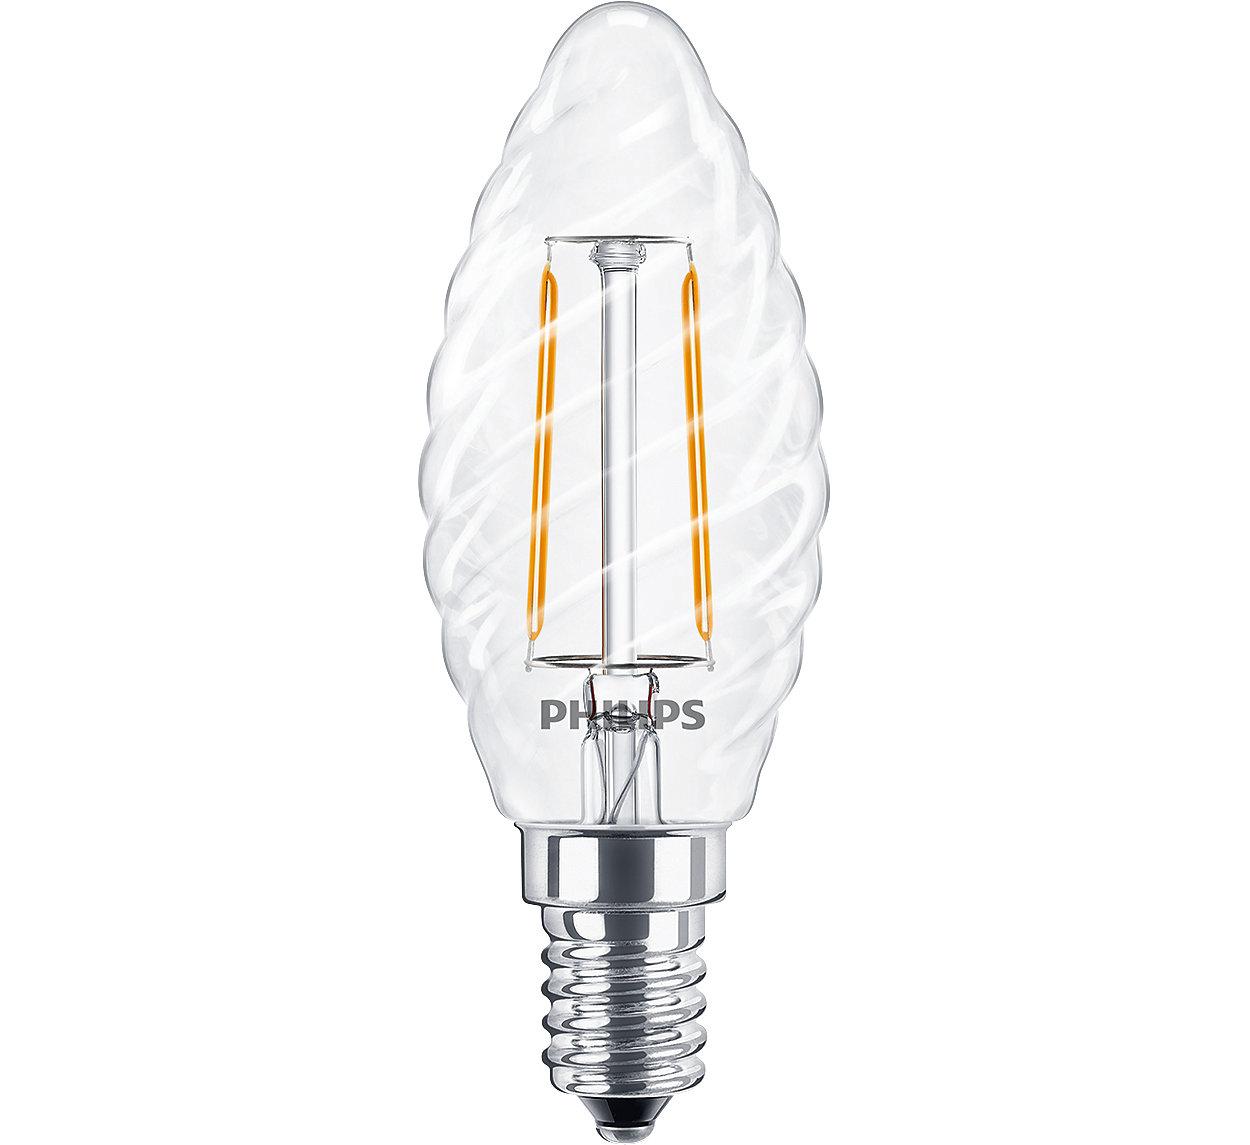 Klassische LED Kerzen- und Tropfenlampen für dekorative Beleuchtung